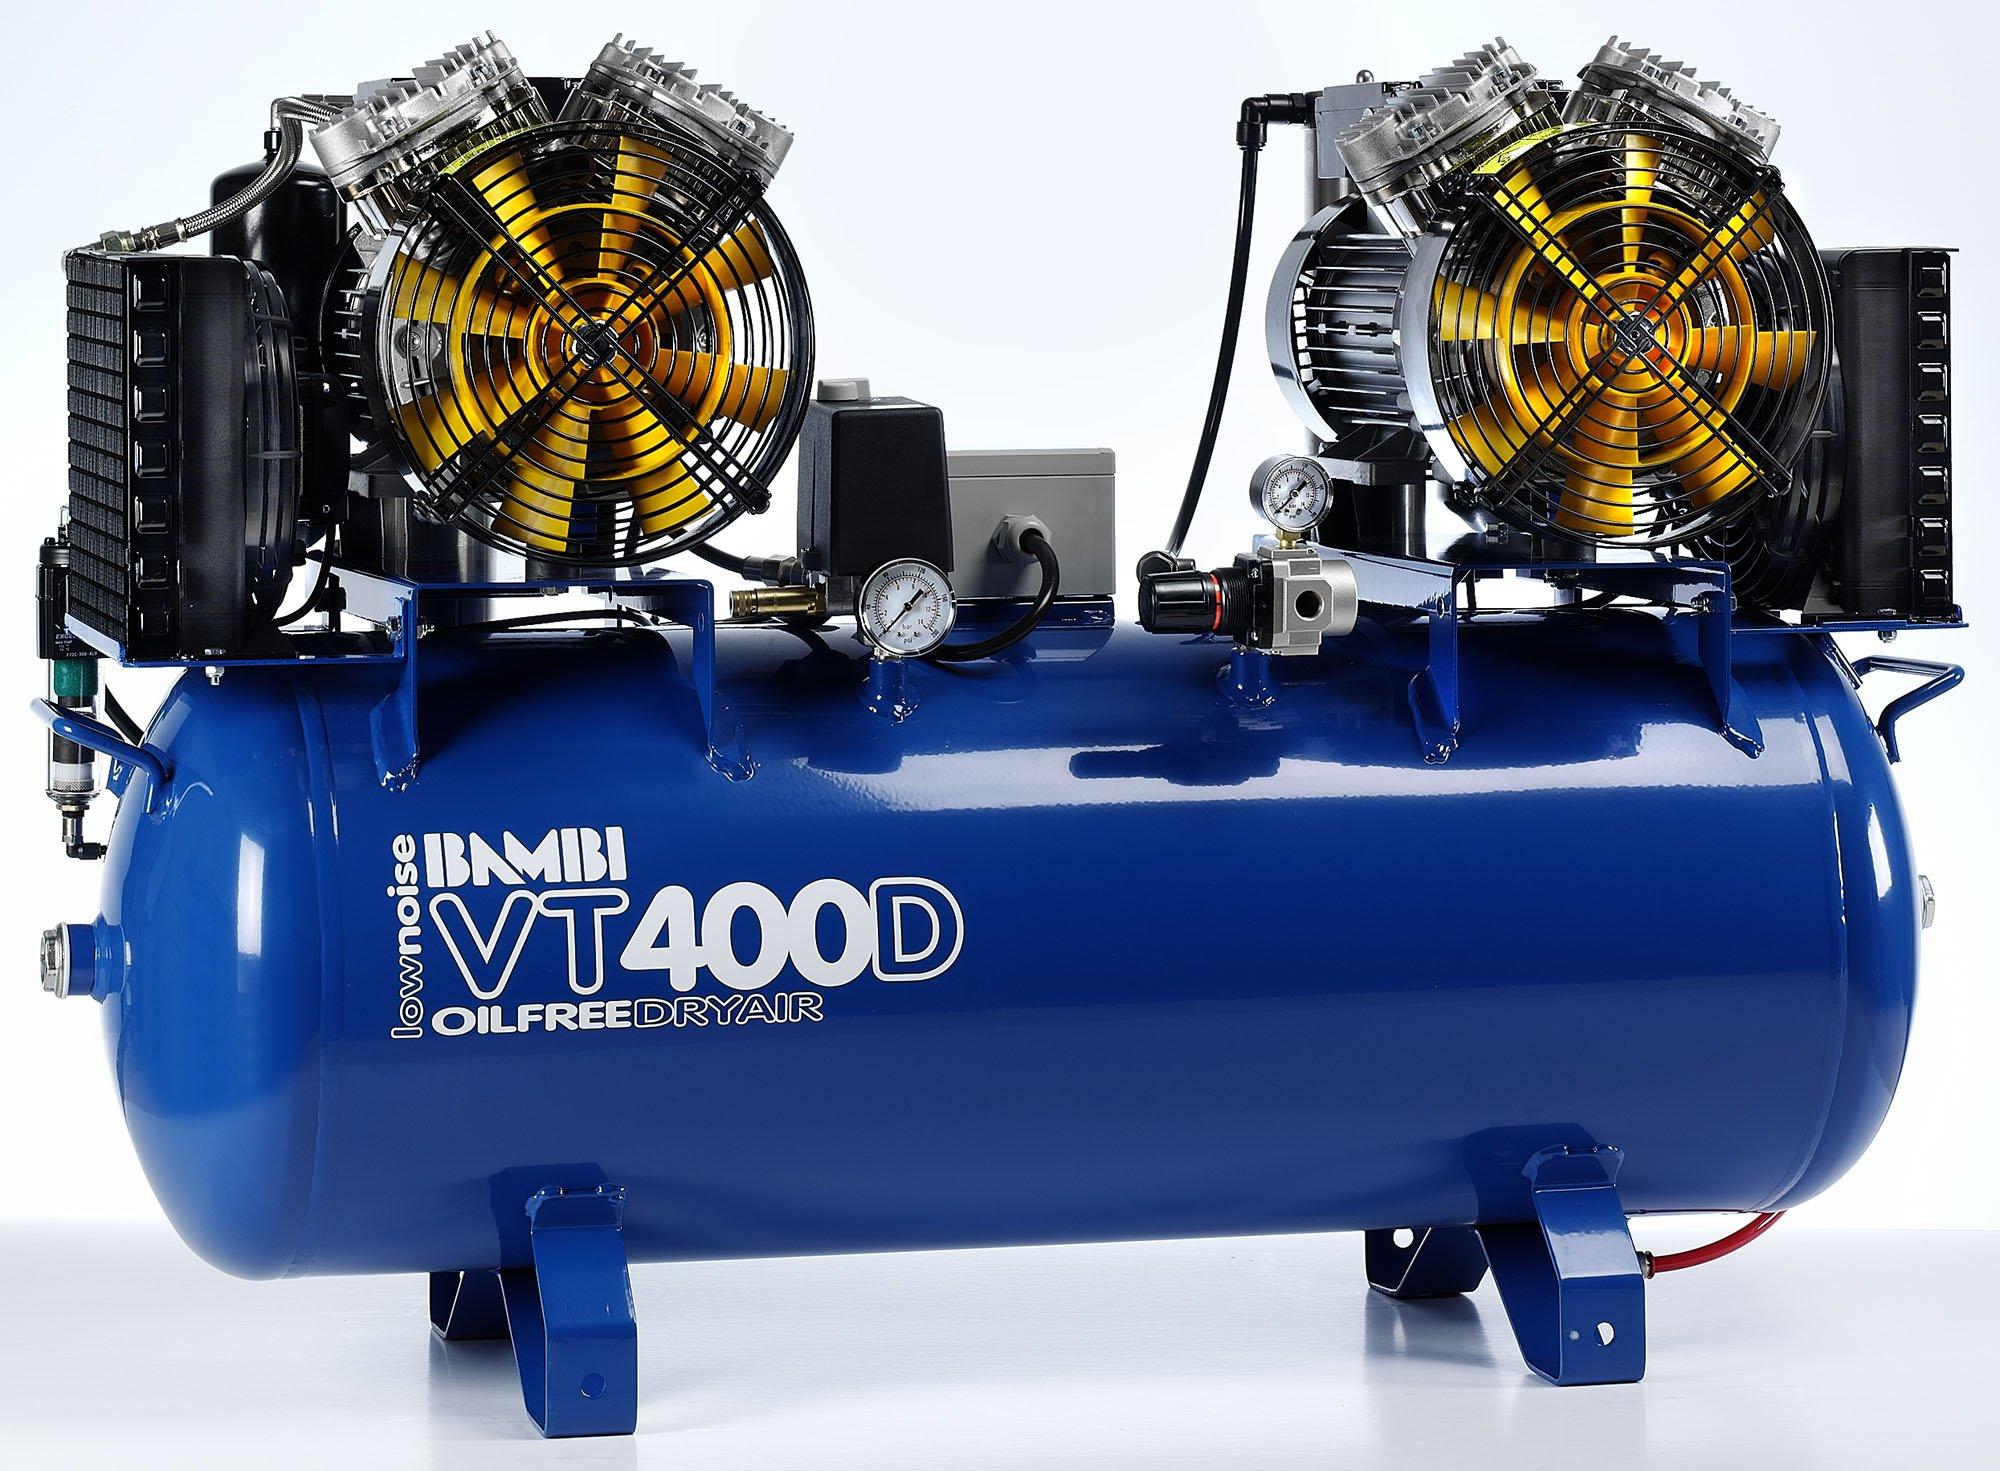 Midlands UK supplier of Bambi VT400D air compressor